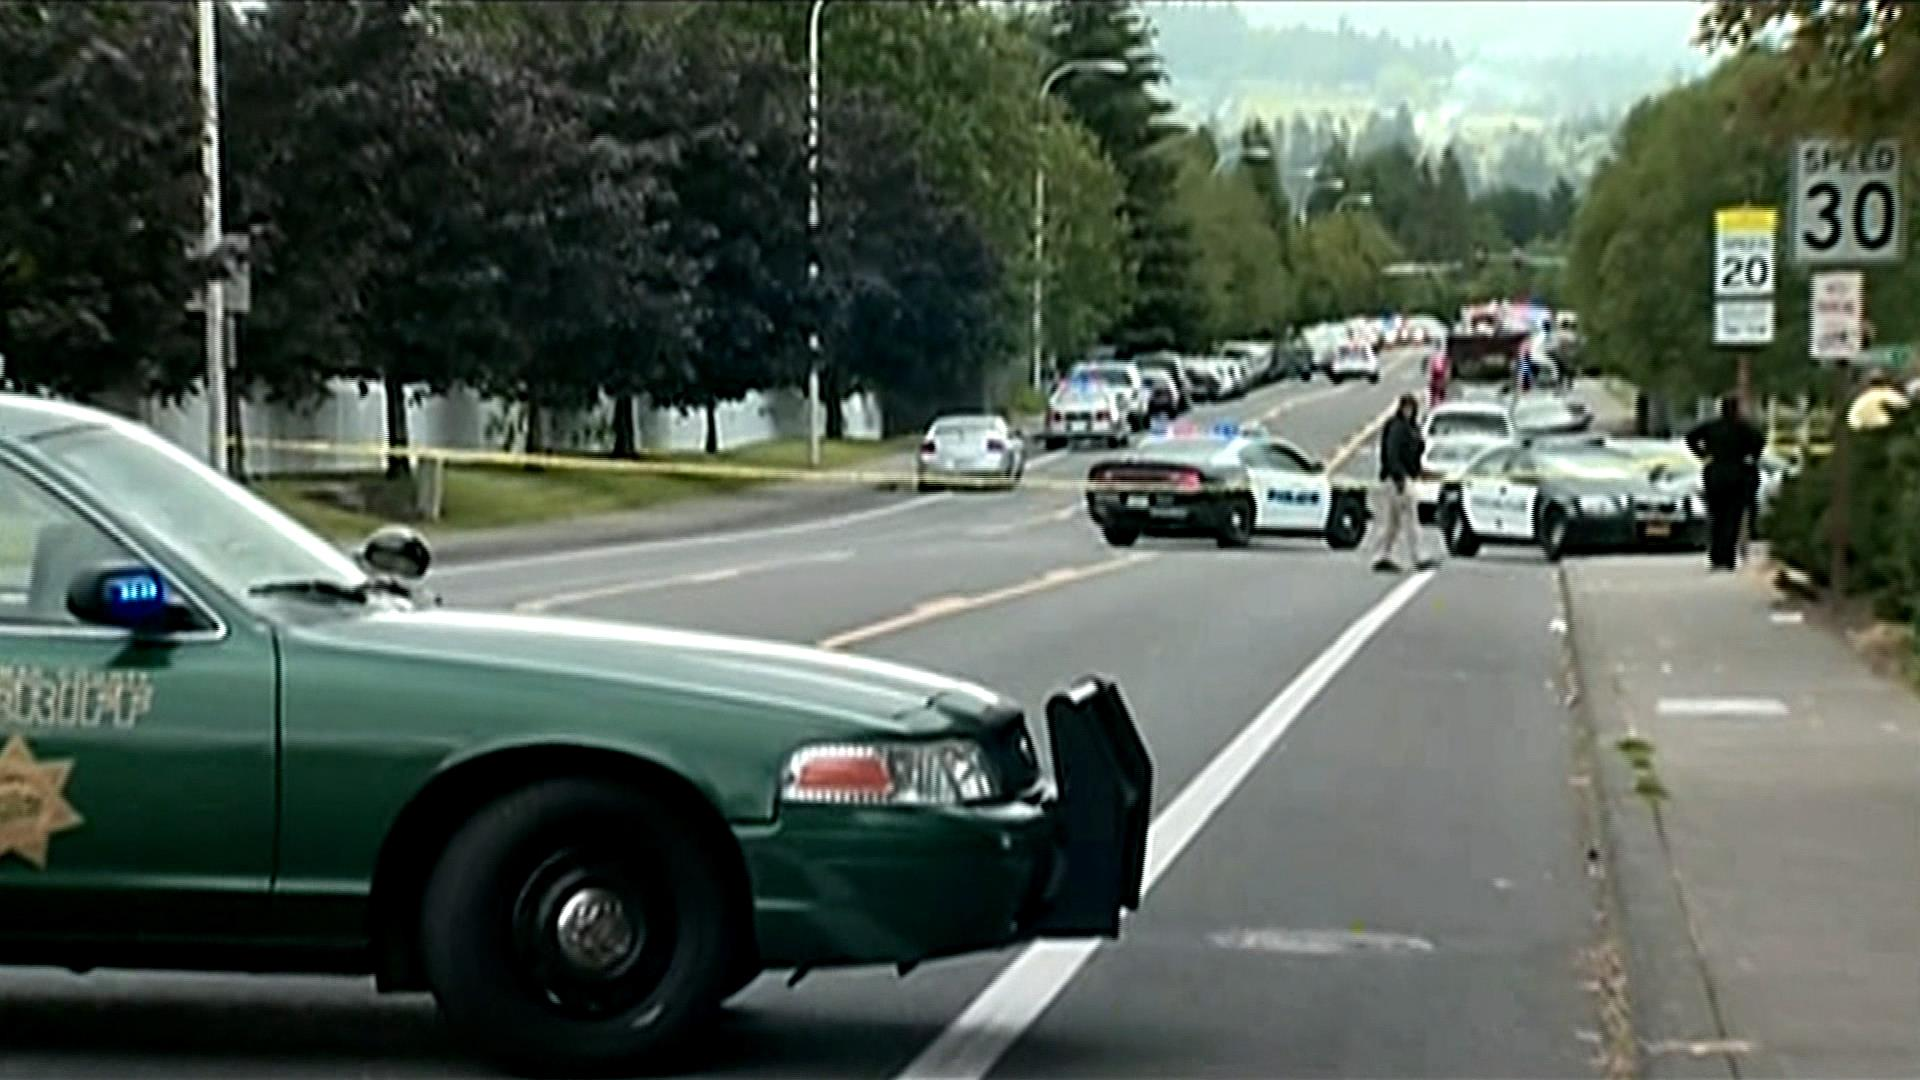 Reports of gunfire at Oregon high school